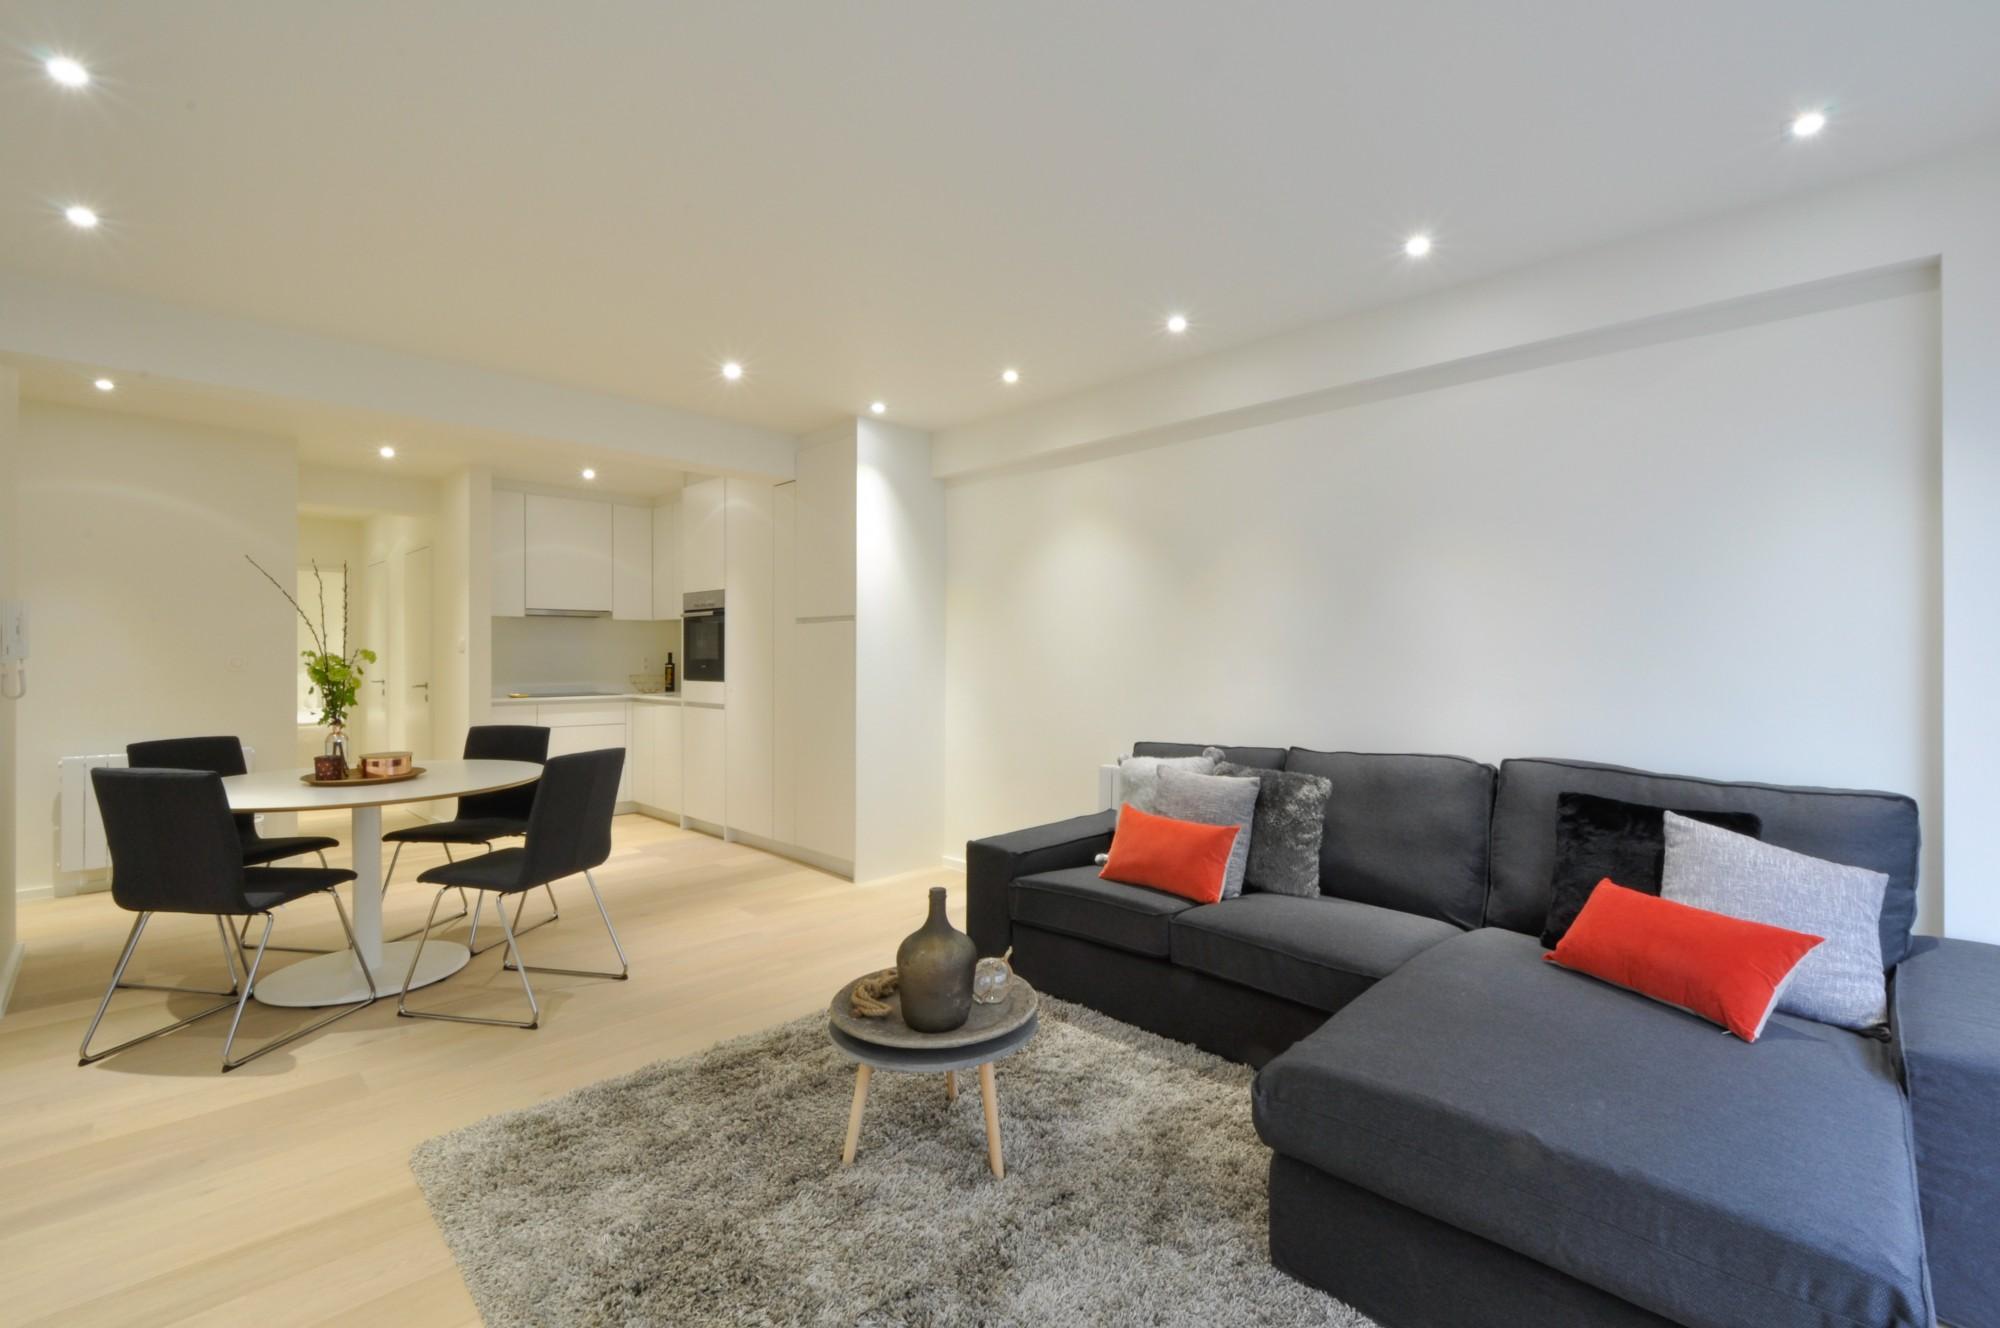 Vente Appartement 2 CH Knokke-Zoute - Zeewindstraat / vue mer laterale